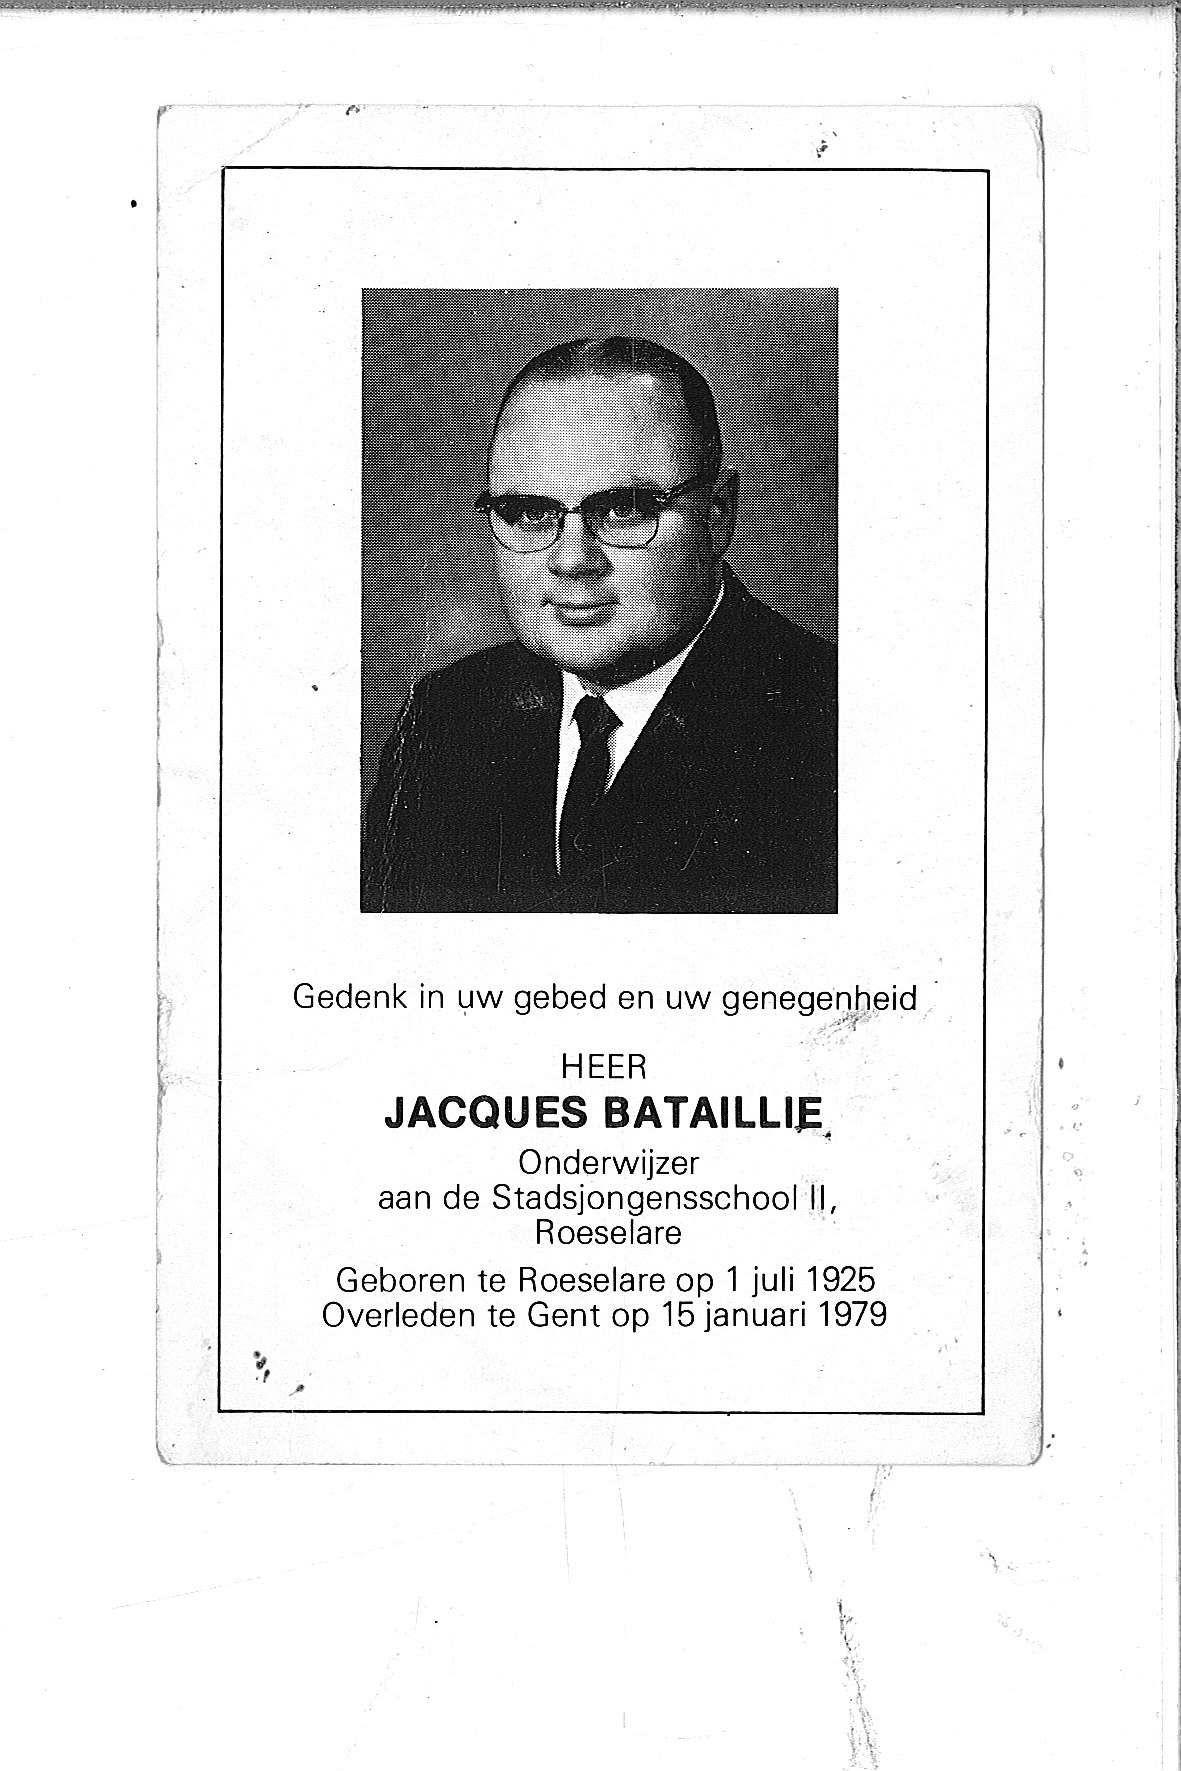 Jacques(1979)20130828105443_00065.jpg